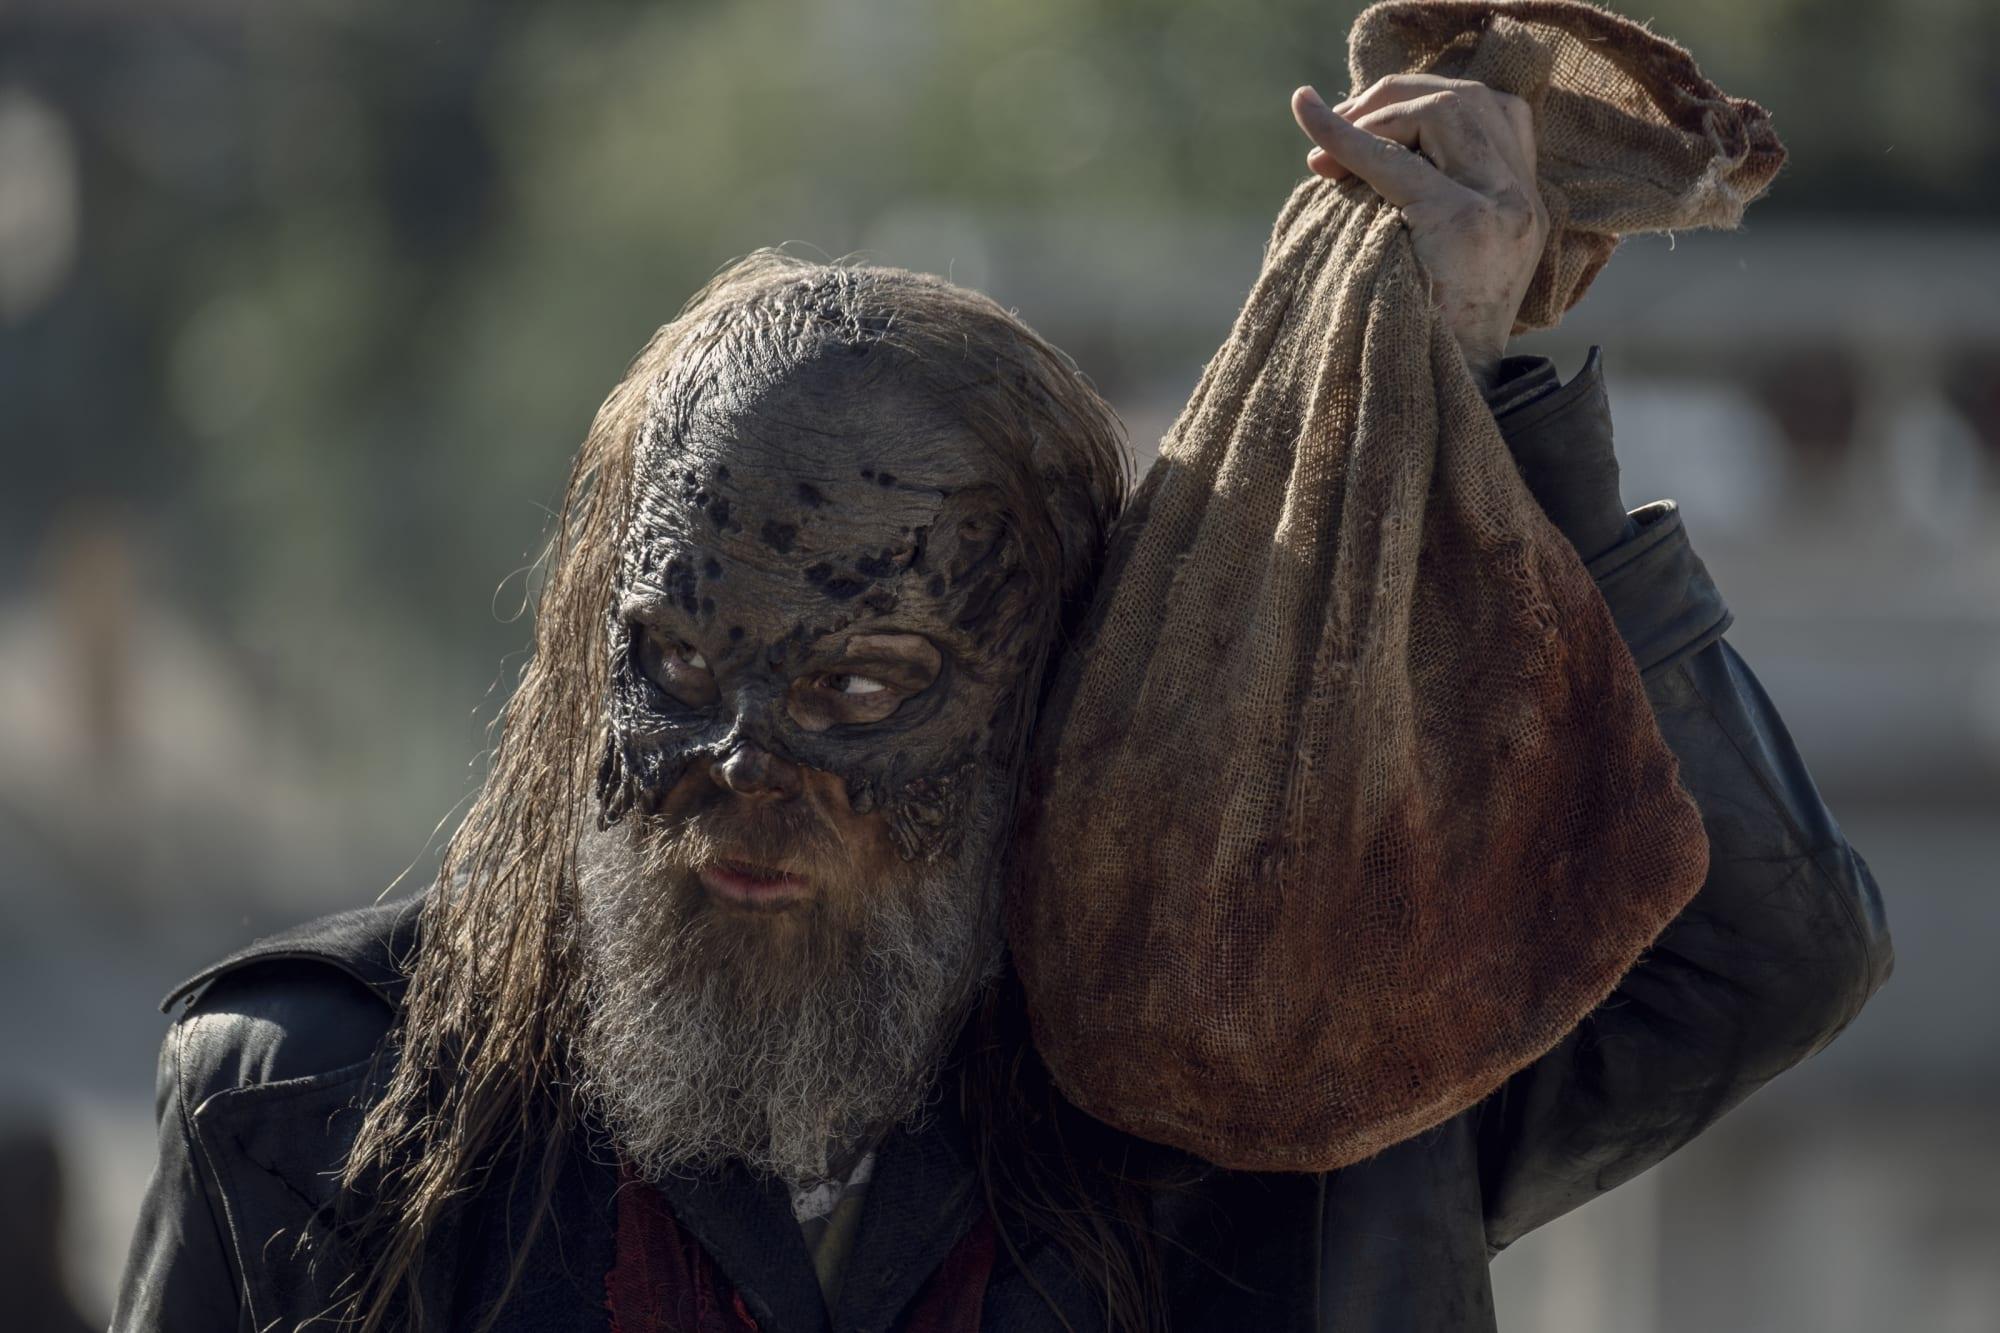 The Walking Dead showrunner teases season 10 finale, air date reveal